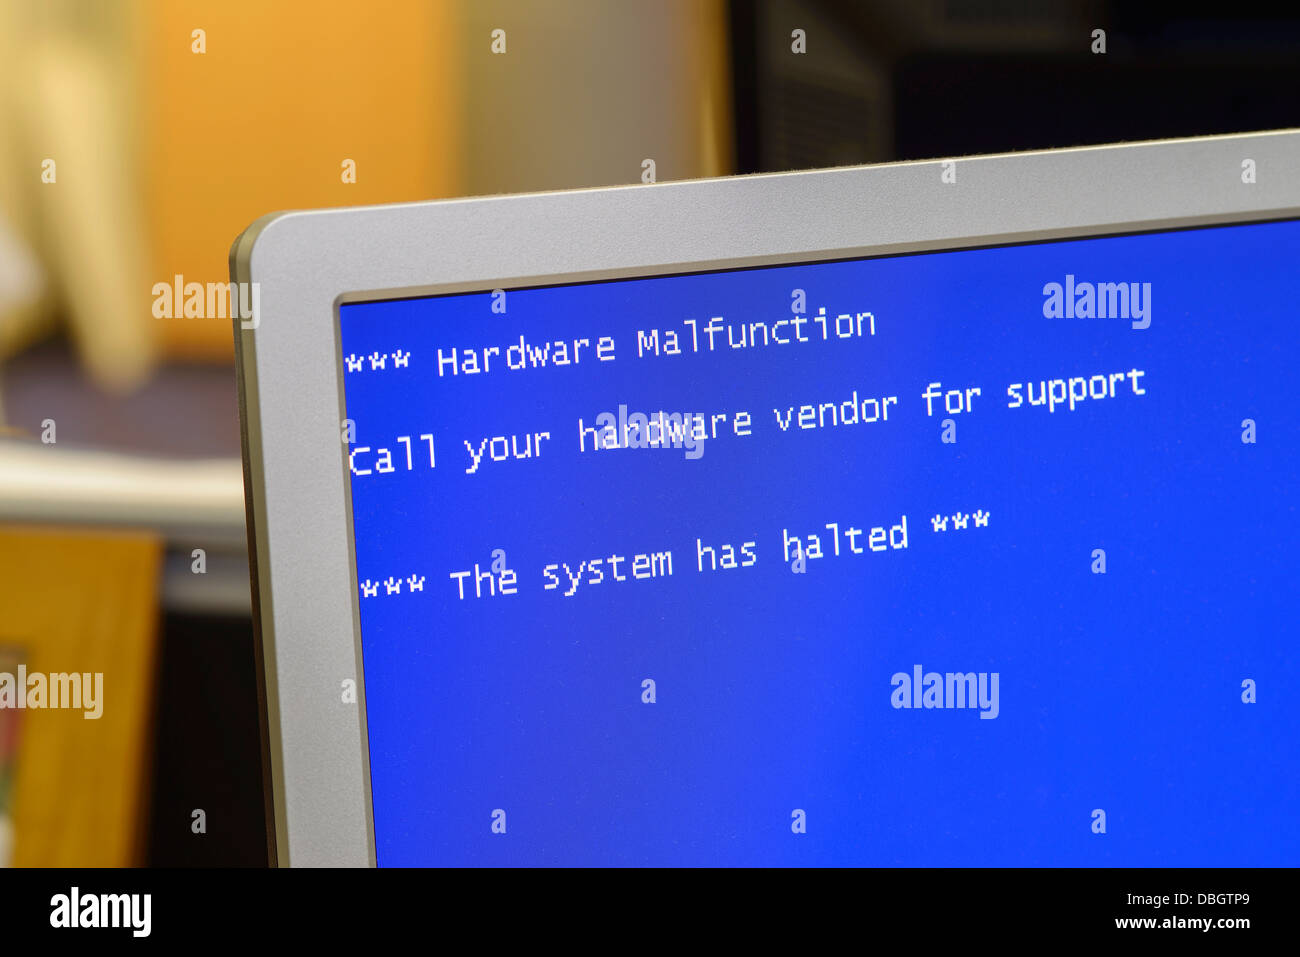 Hardware-Fehlfunktion-Computer-Fehlermeldung Stockbild